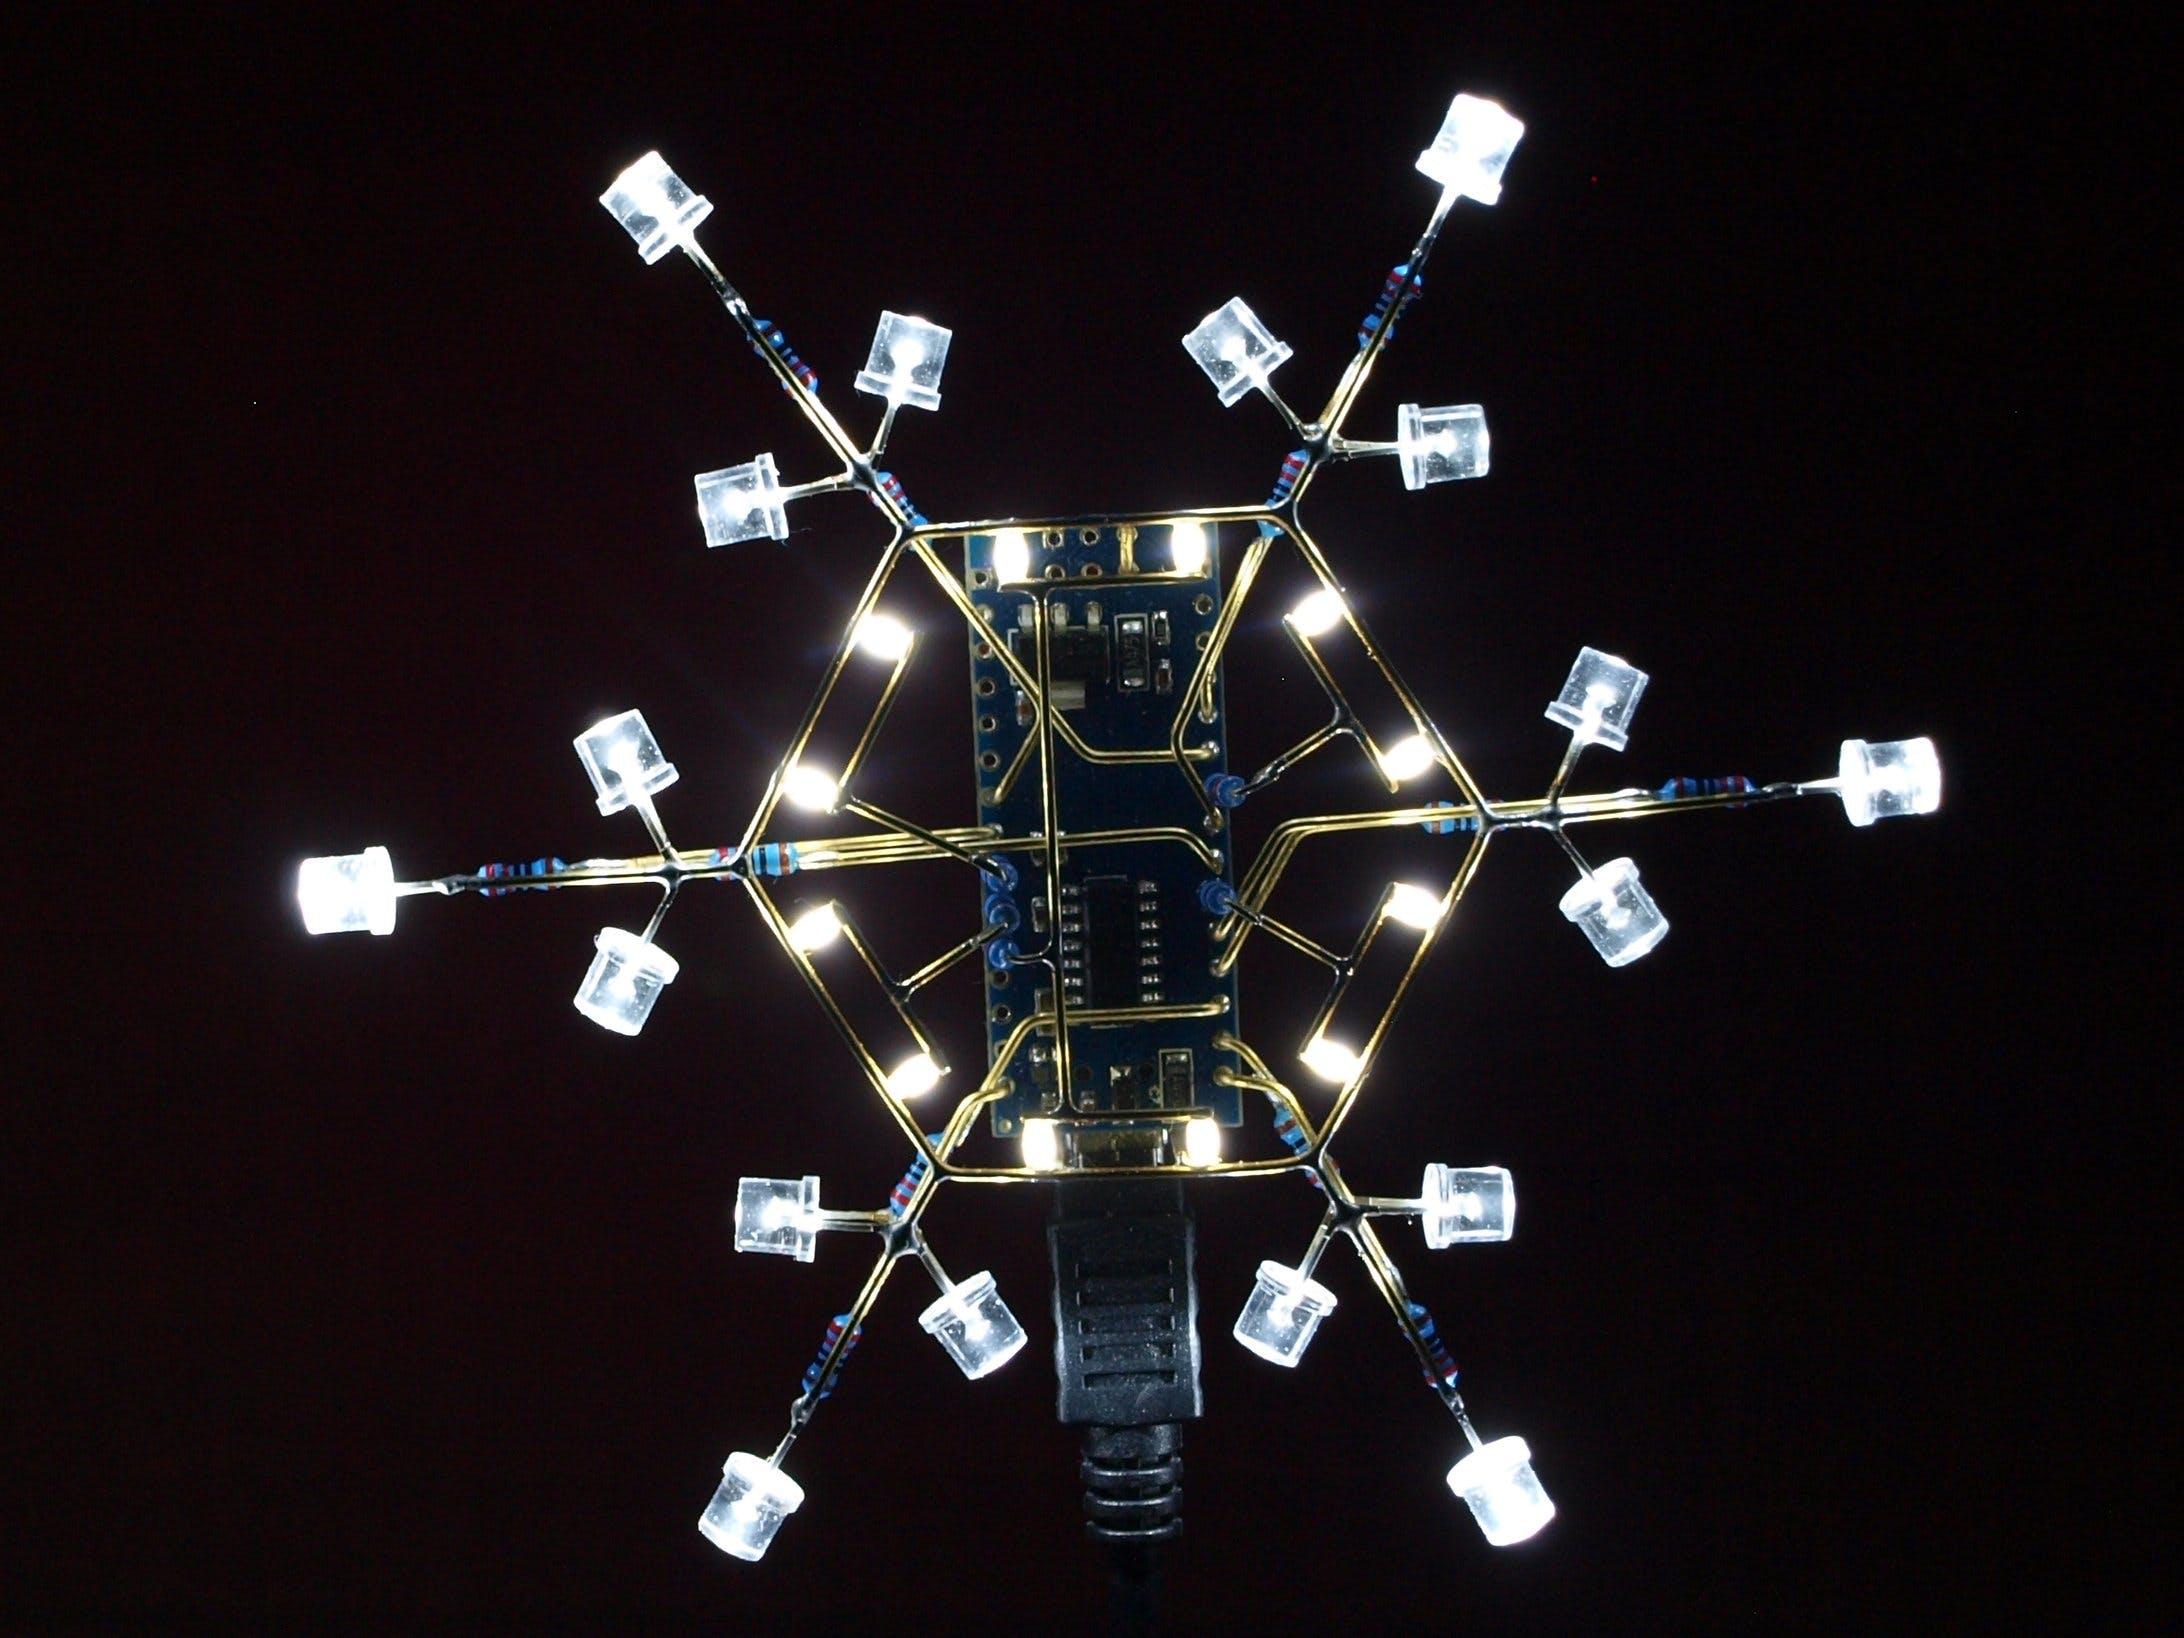 Arduinoflake!